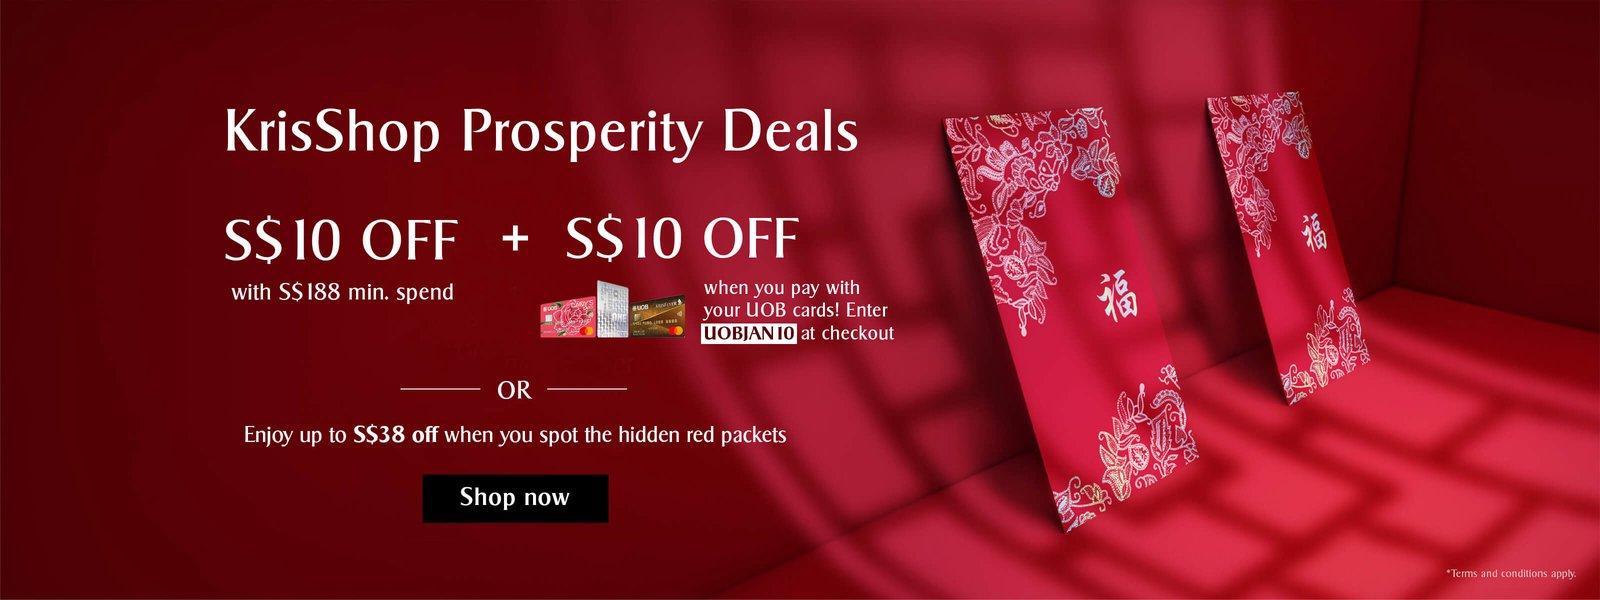 KrisShop Prosperity Deals